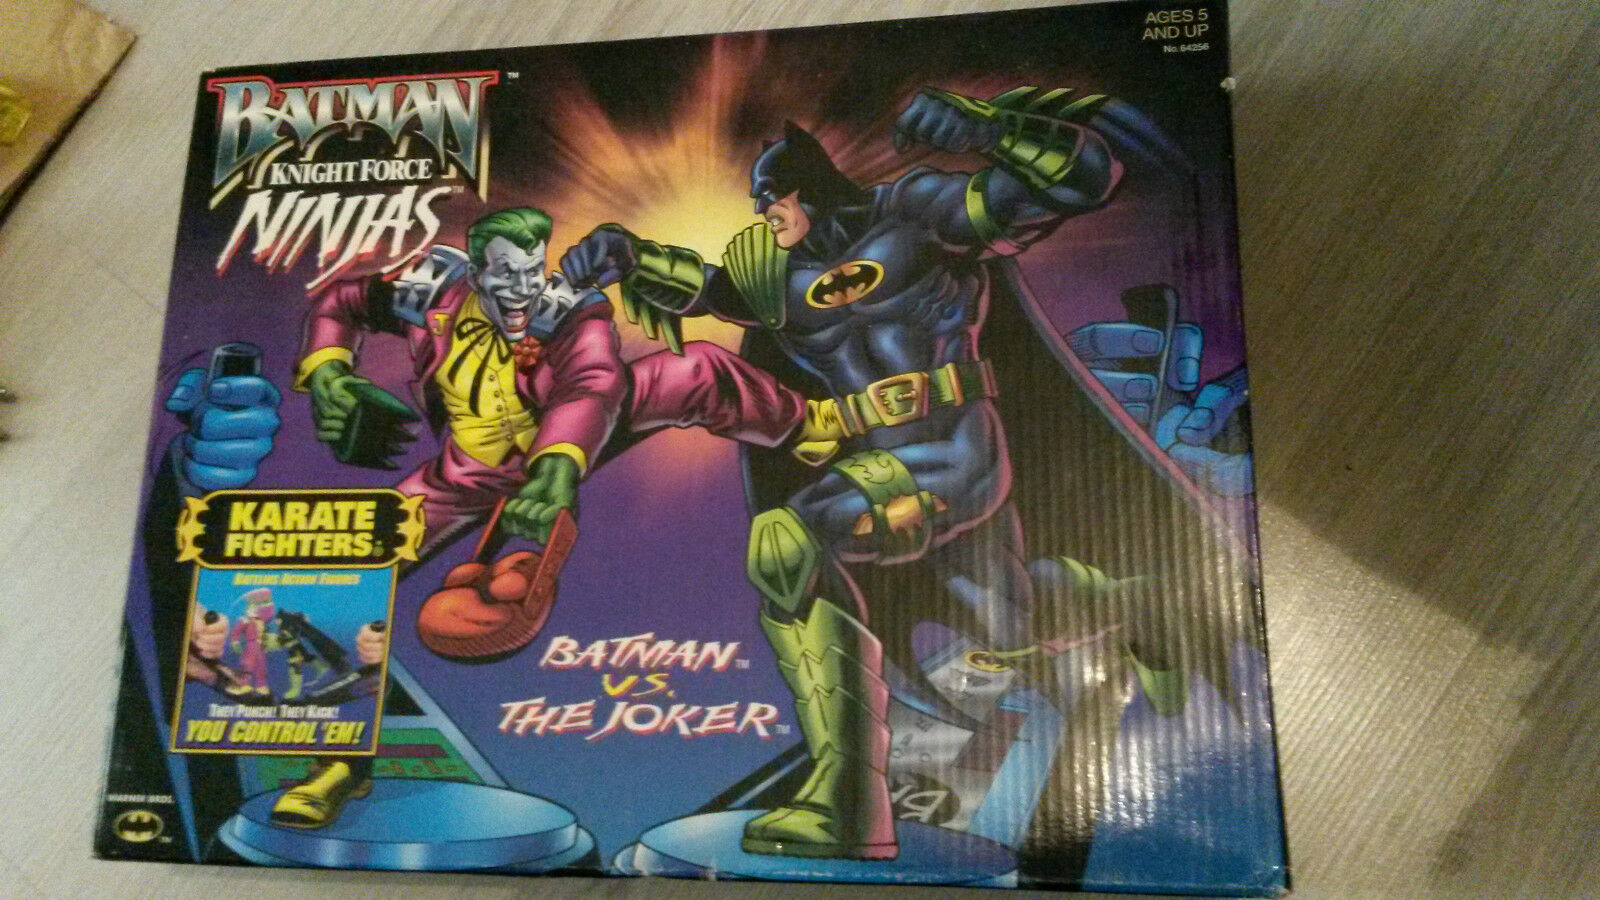 Batman und joker karate - kämpfer ritter kraft ninjas hasbro 1998 vintage selten moc